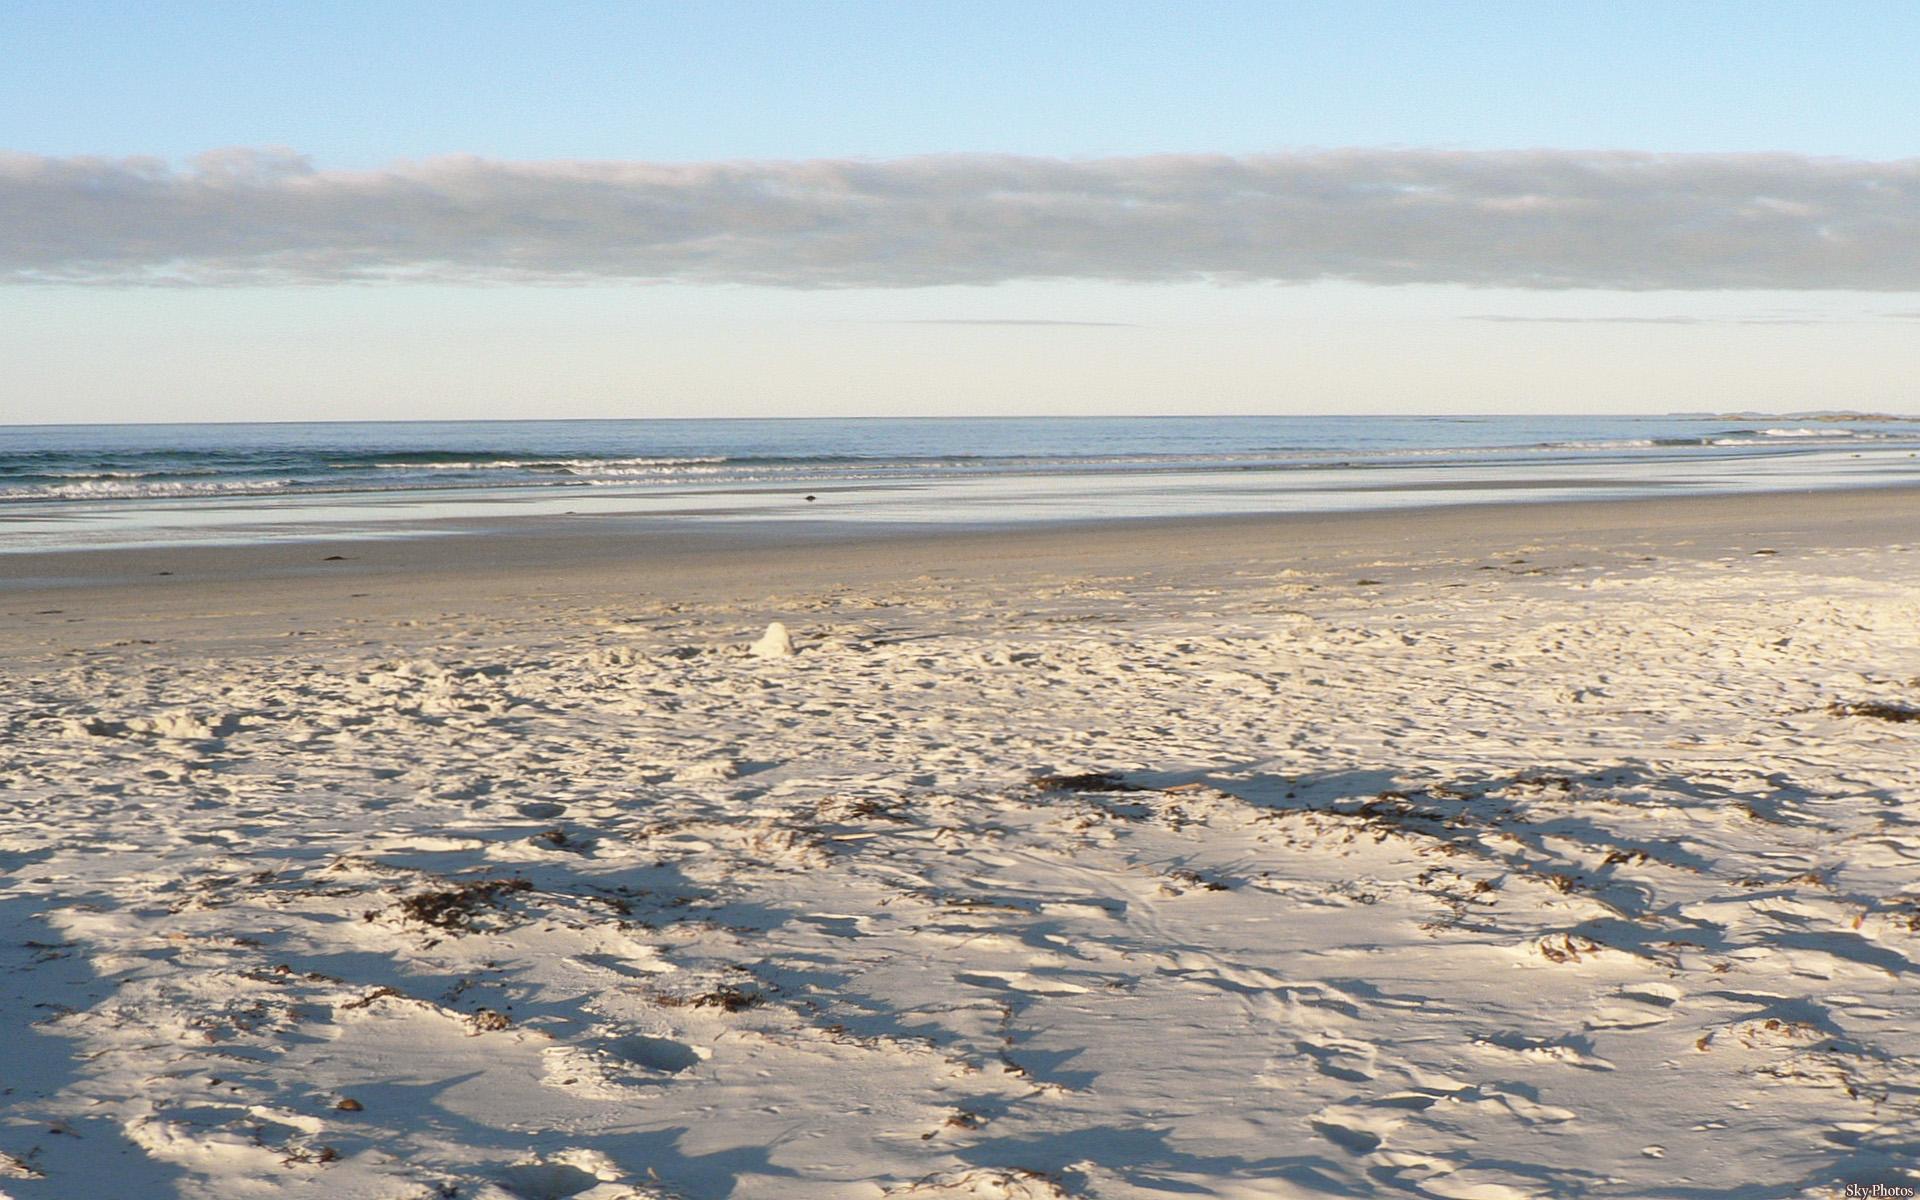 Sandy Beach Wallpaper: Sandy Beach Wallpaper